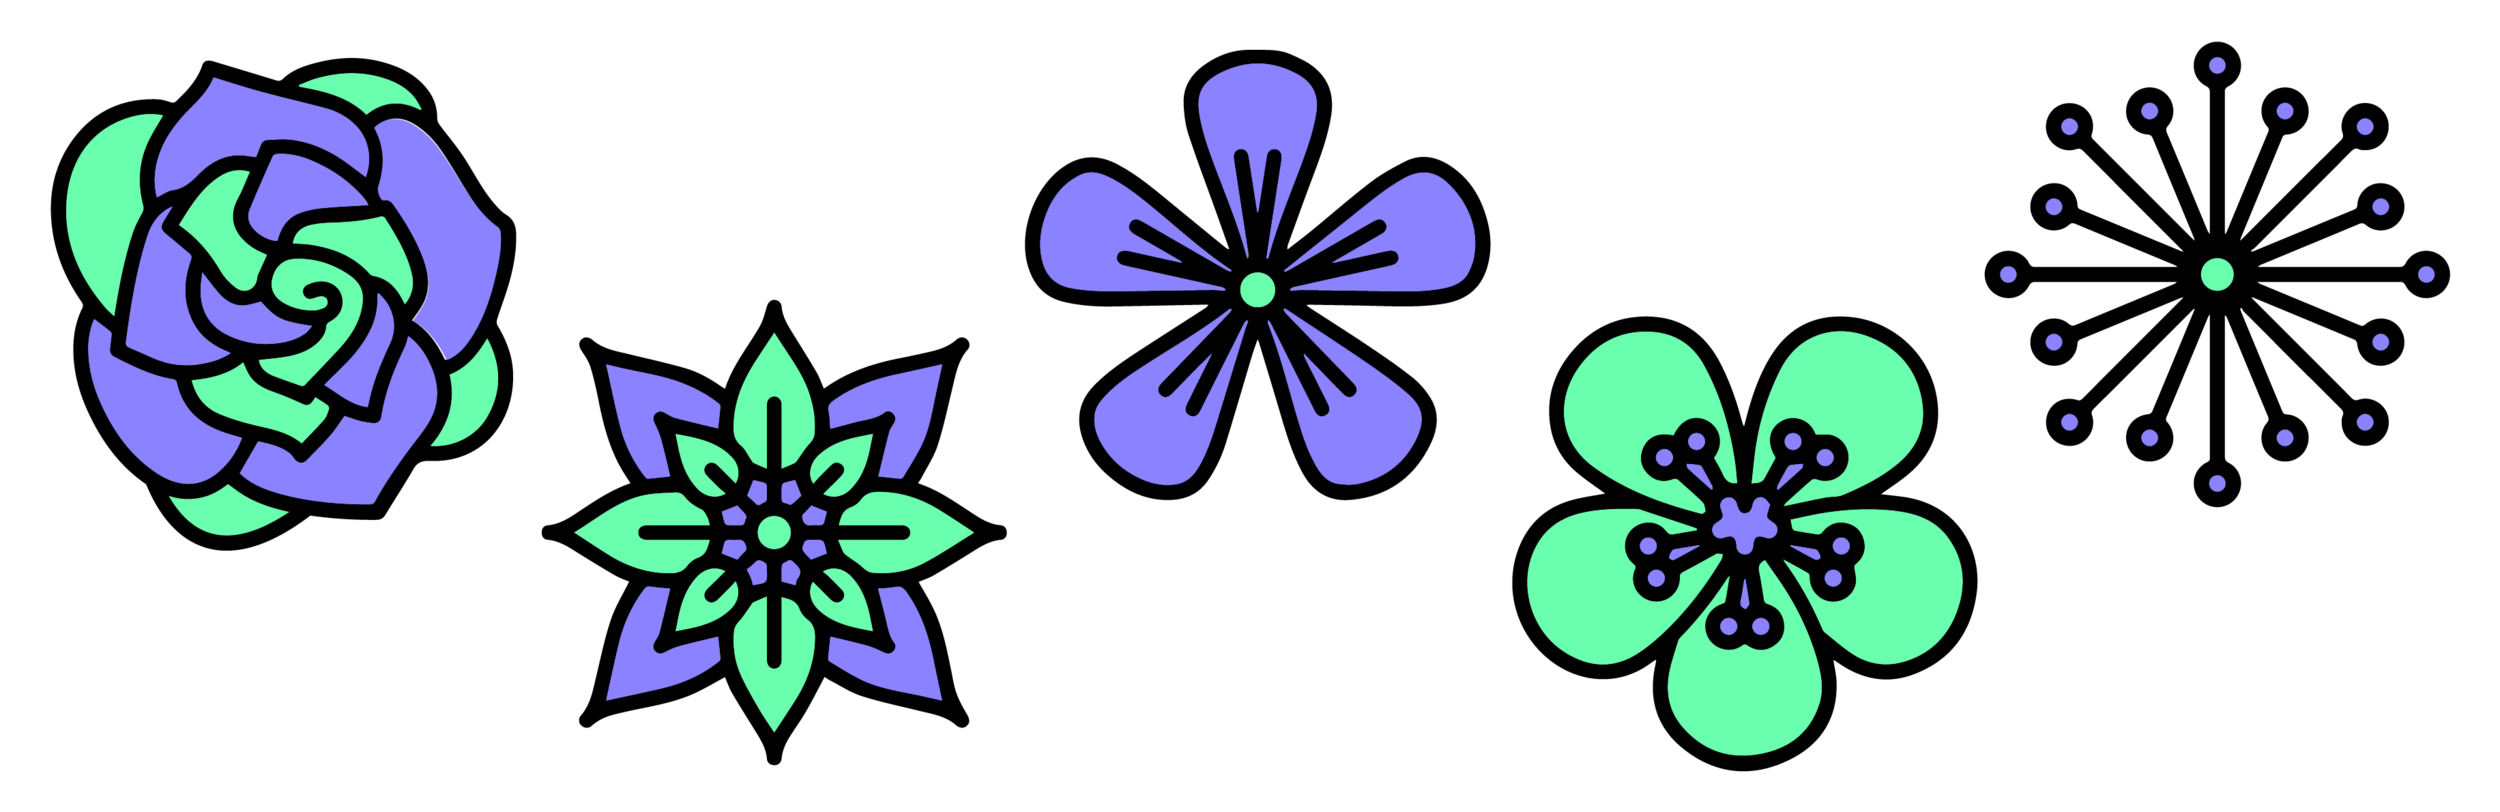 Emerald Dream flowers bouquet